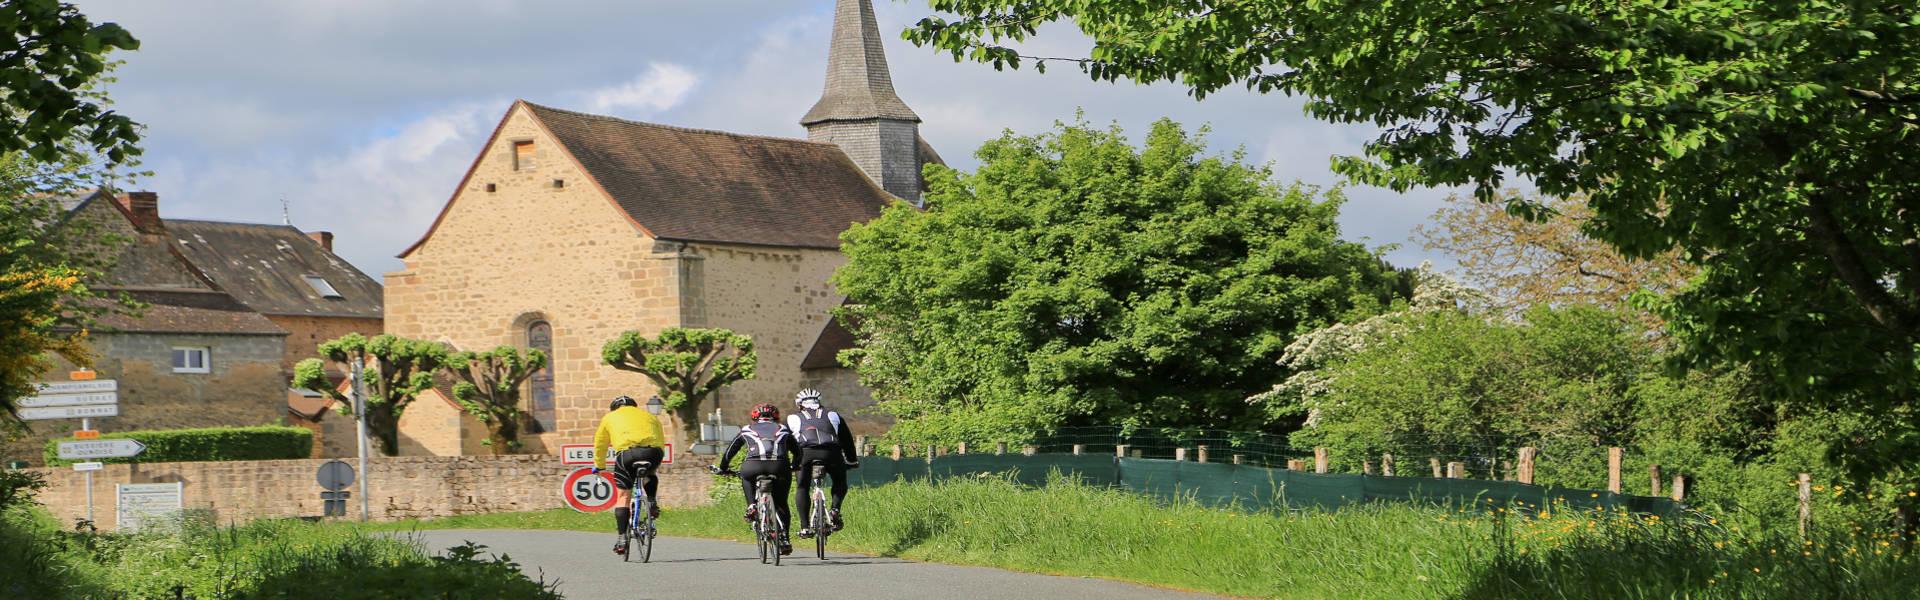 Cyclists Church